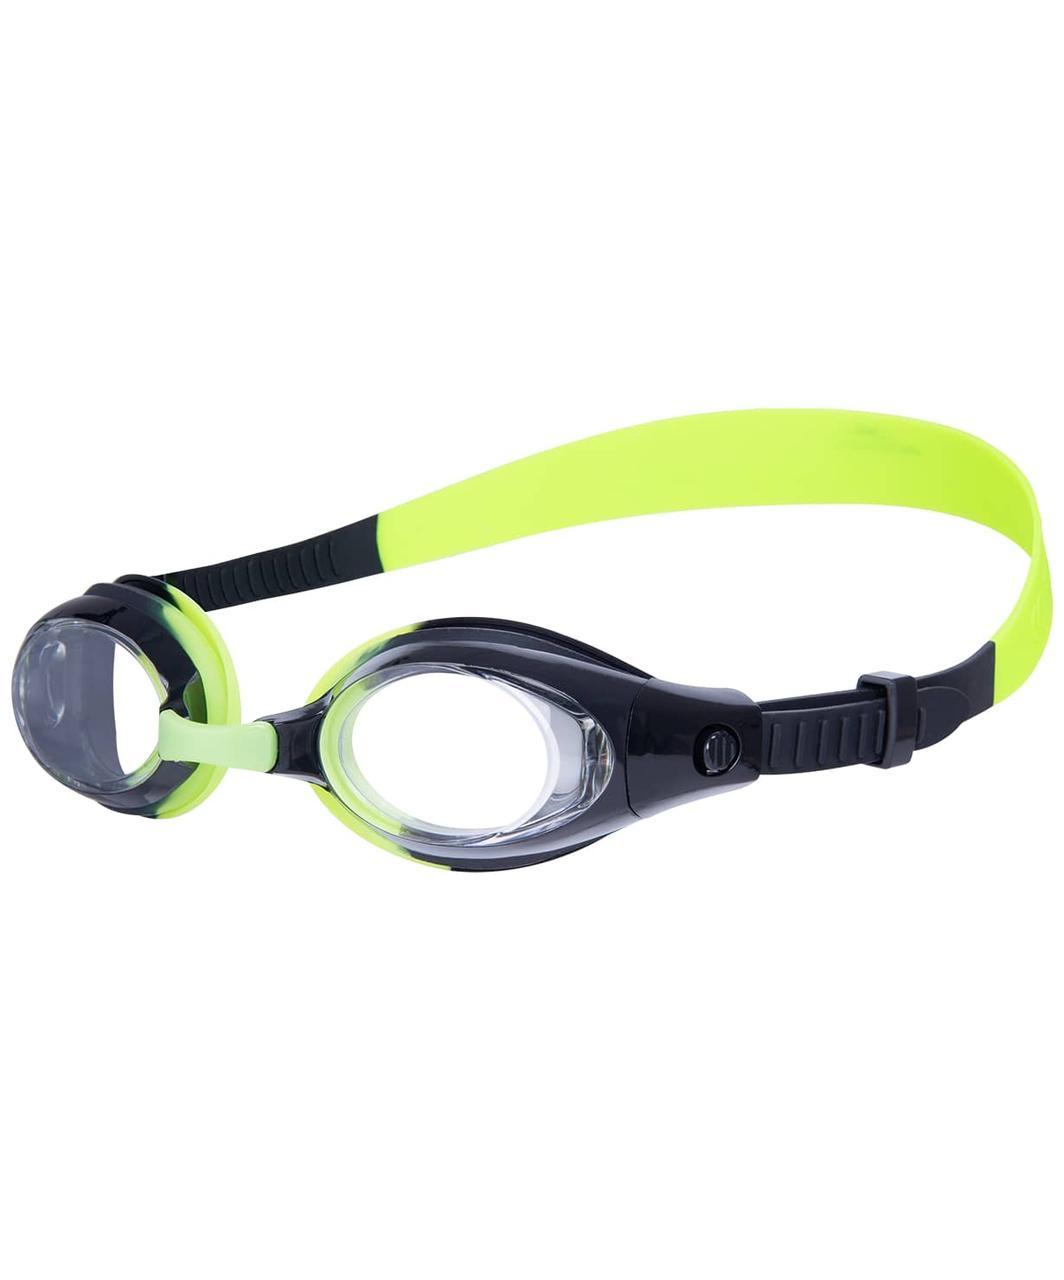 Очки для плавания Flappy Green/Black, детские 25Degrees